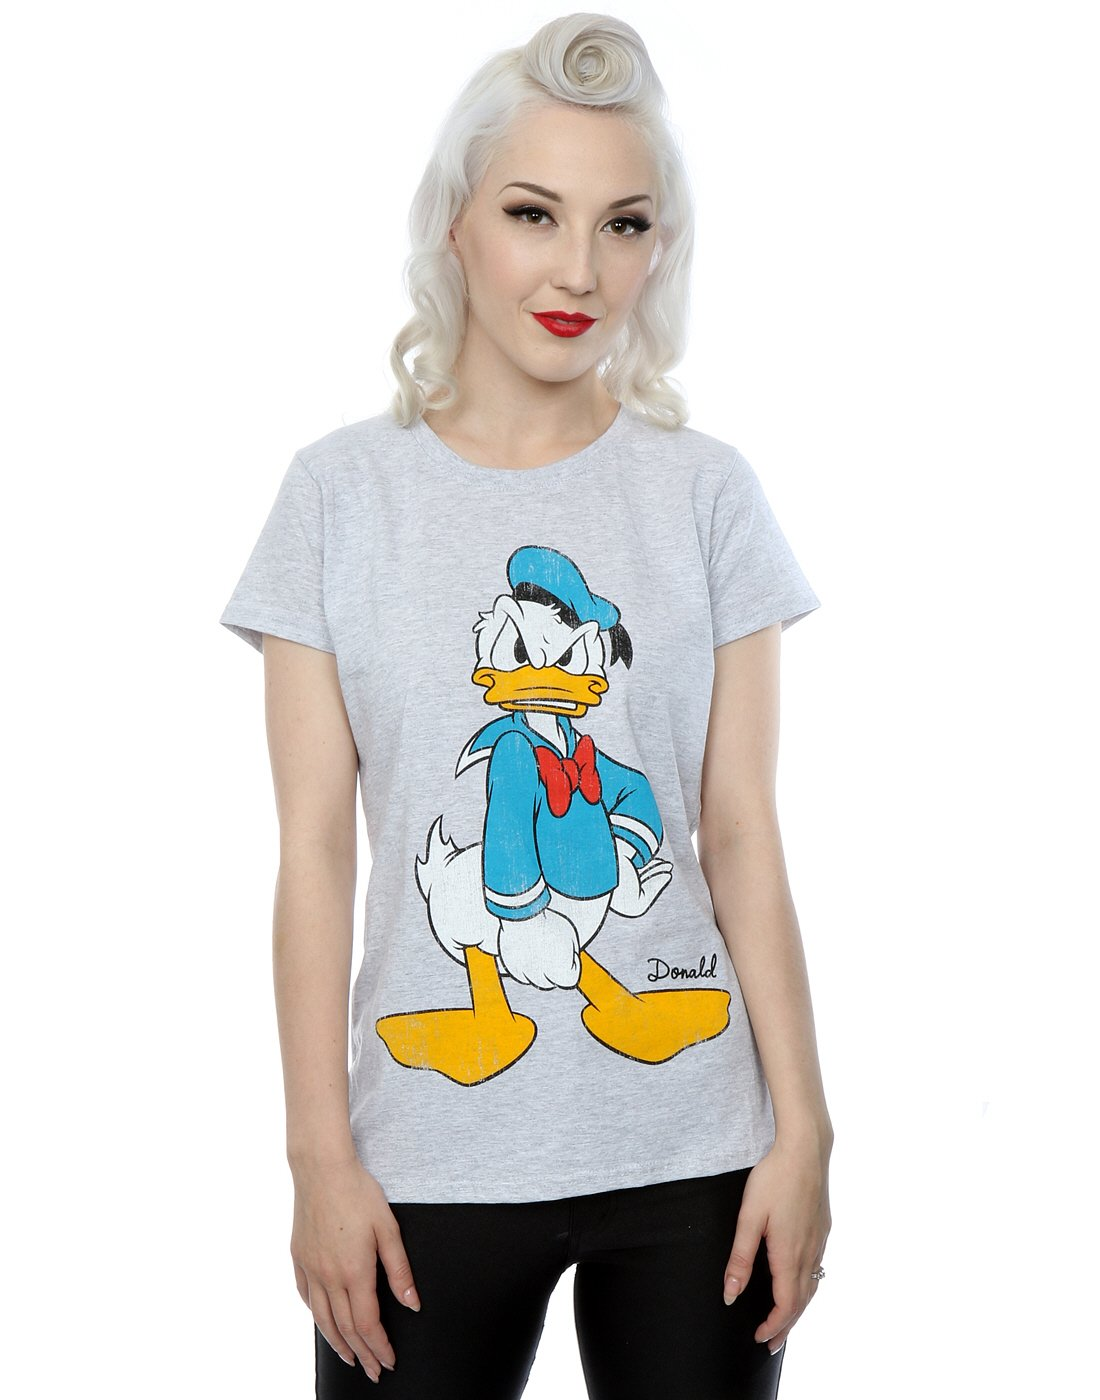 Disney Women's Donald Duck Angry T-Shirt X-Large Heather Grey